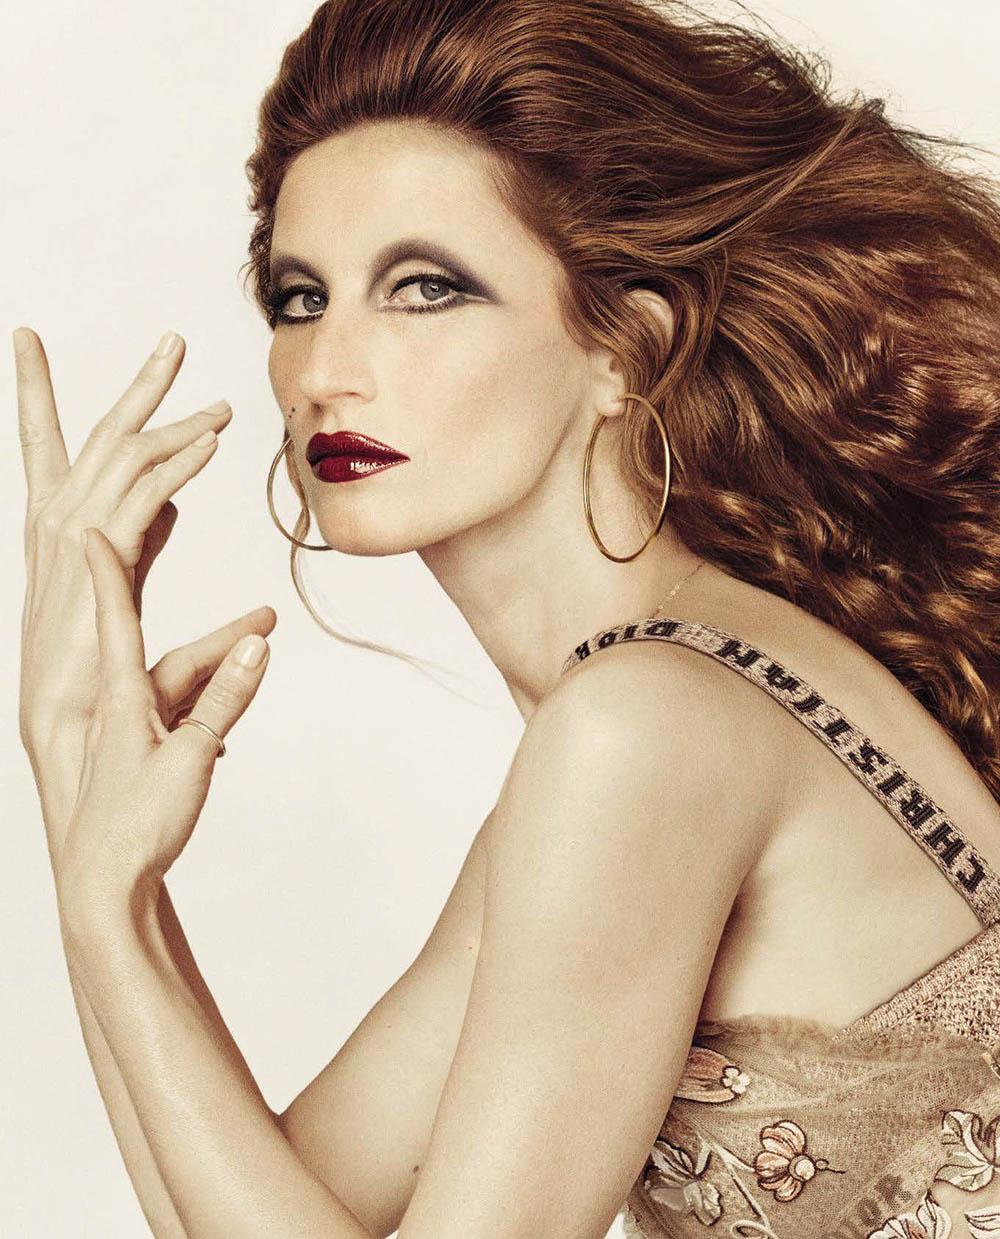 Gisele Bündchen covers Vogue Italia October 2018 by Luigi & Iango